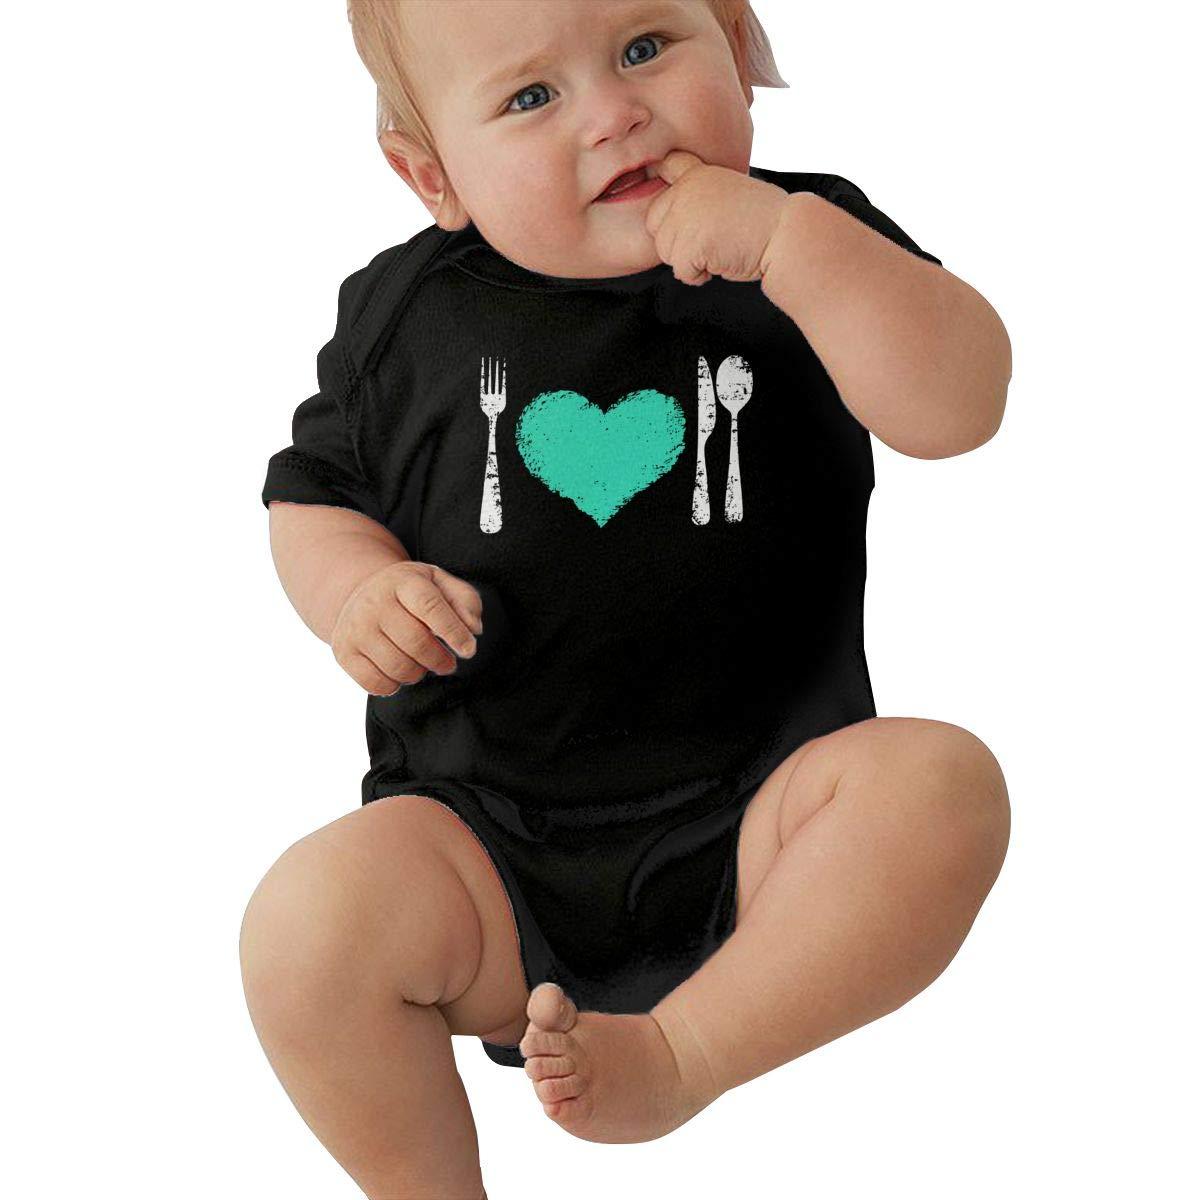 LBJQ9 My Boyfriend is Vegan Newborn Baby Girl Infant Organic Cotton Short Sleeve Jumpsuit Overall Romper